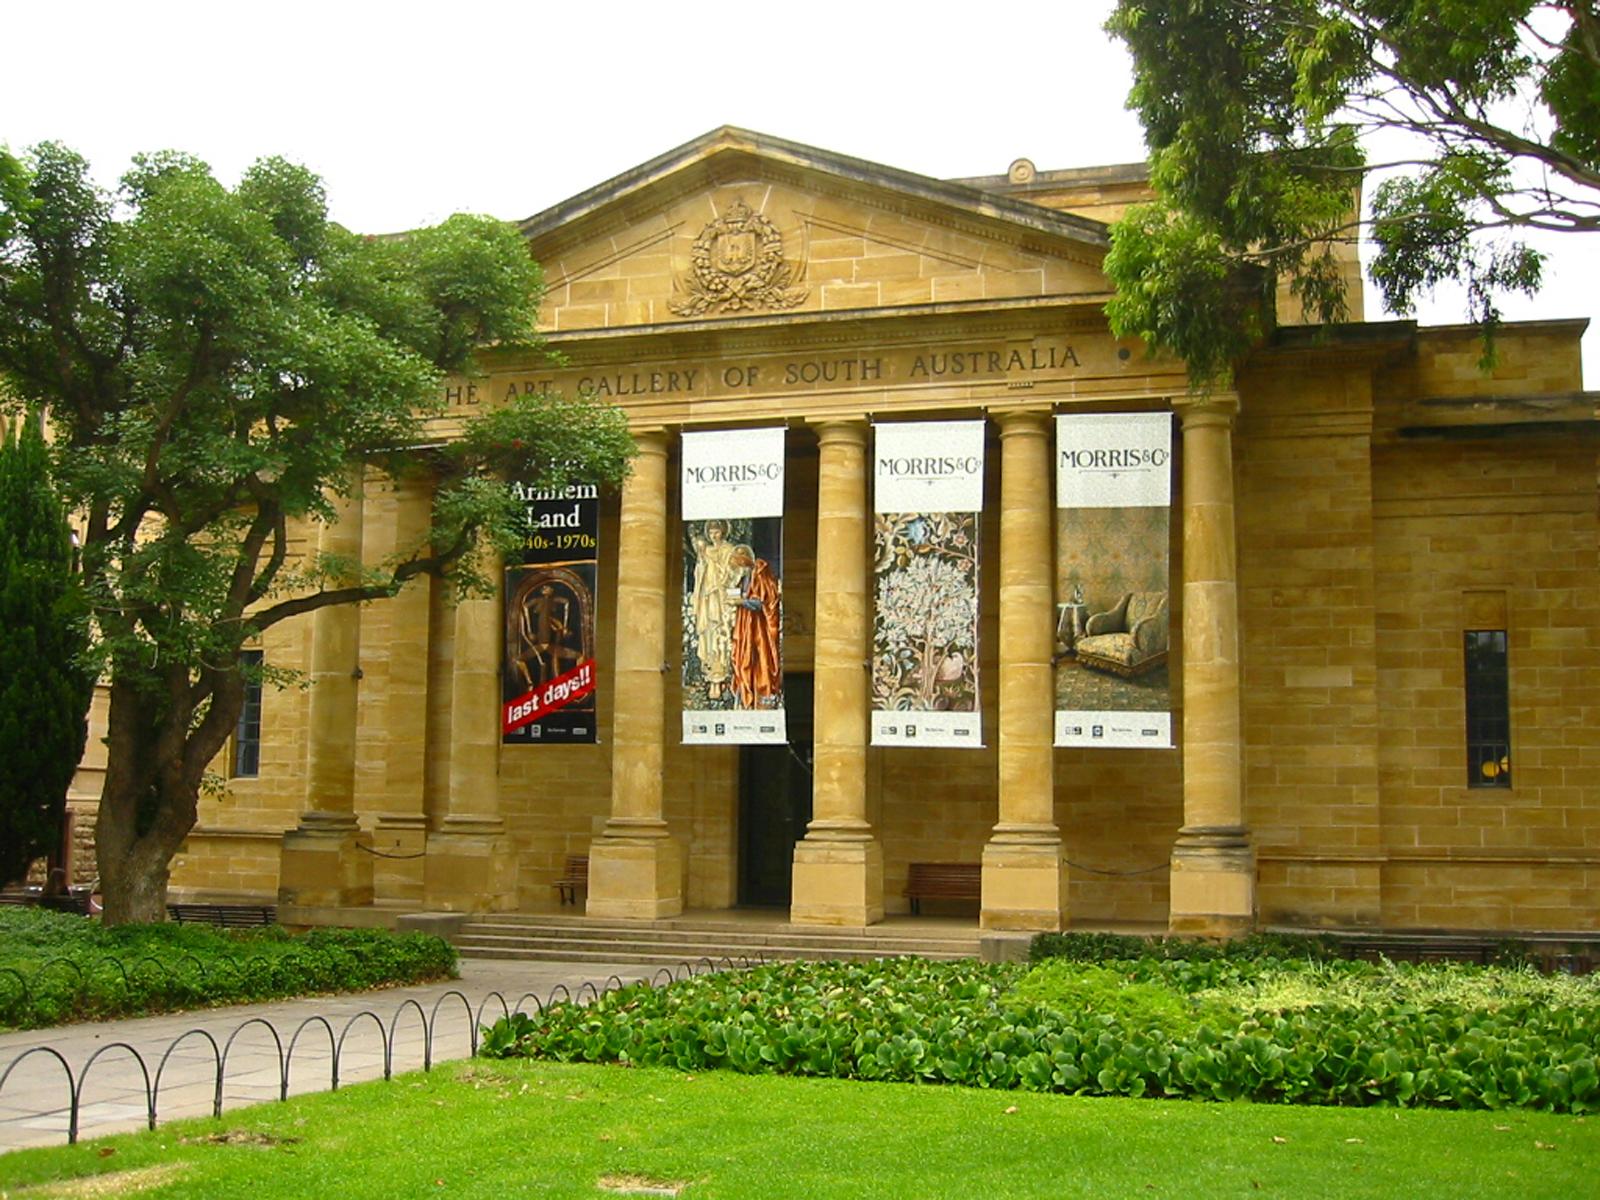 File:Art Gallery Adelaide.jpg - Wikimedia Commons